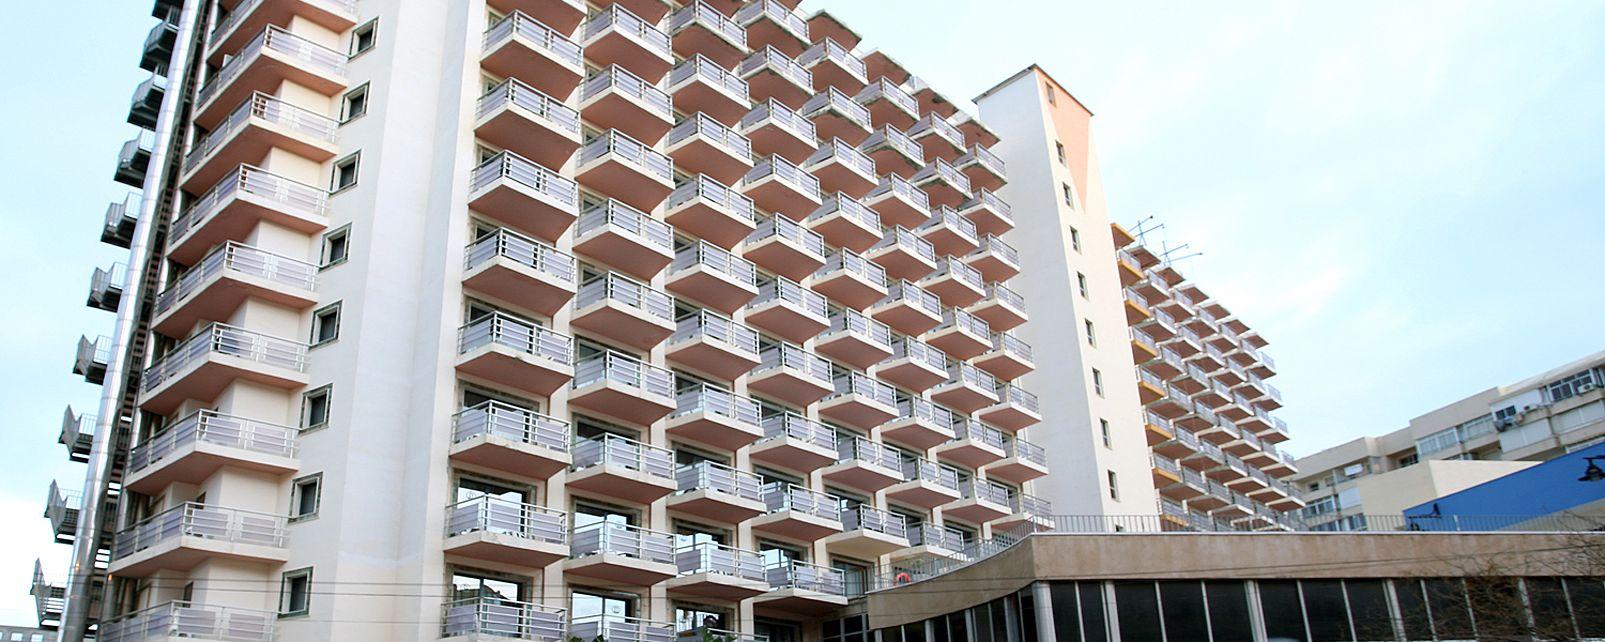 Hôtel Natali